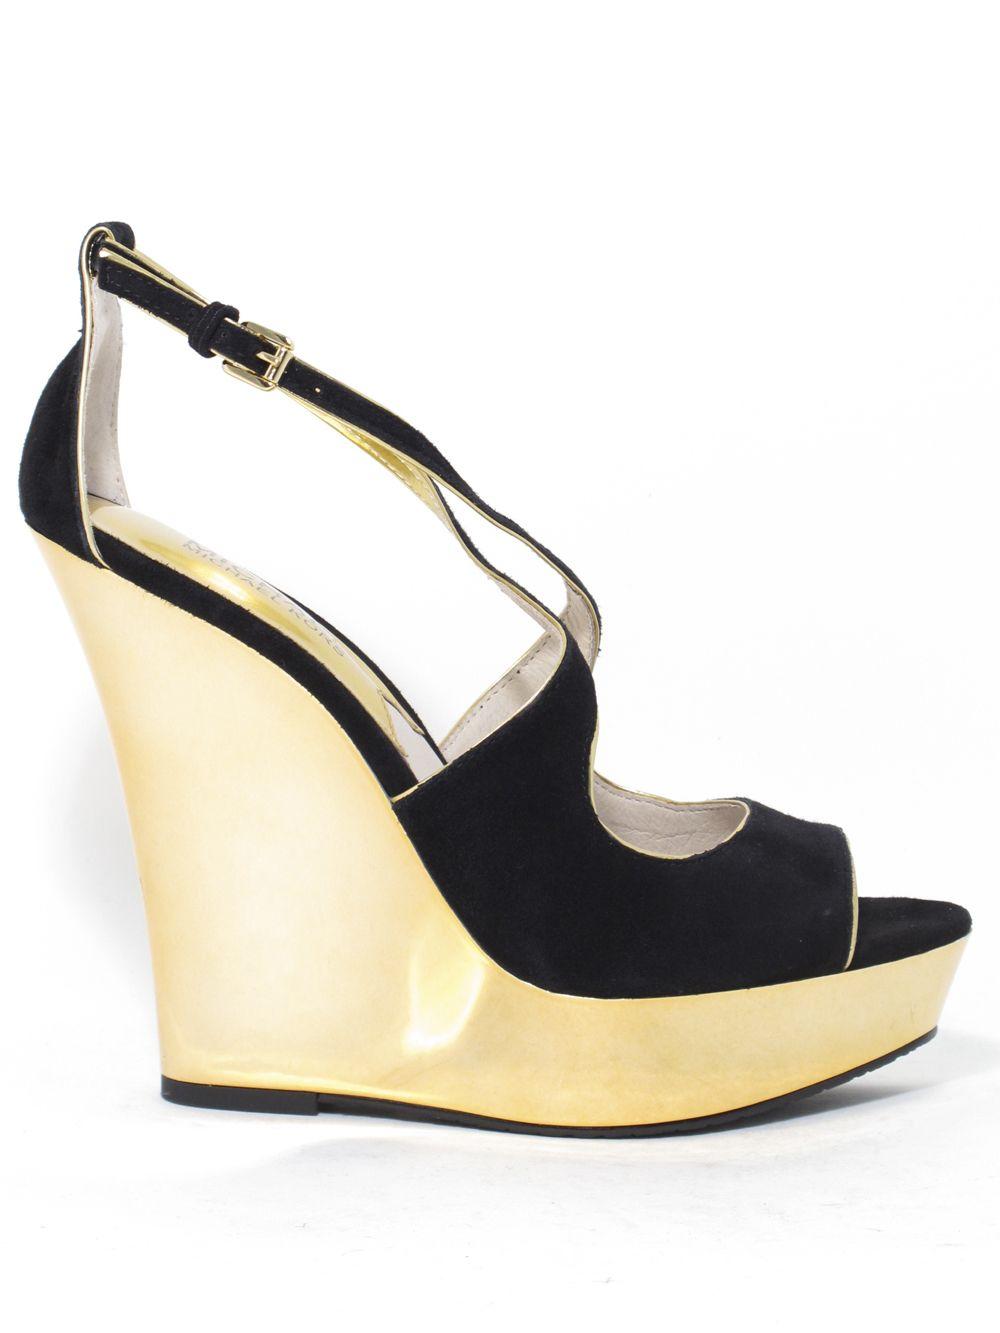 mk shoes sale canada michael kors on sale